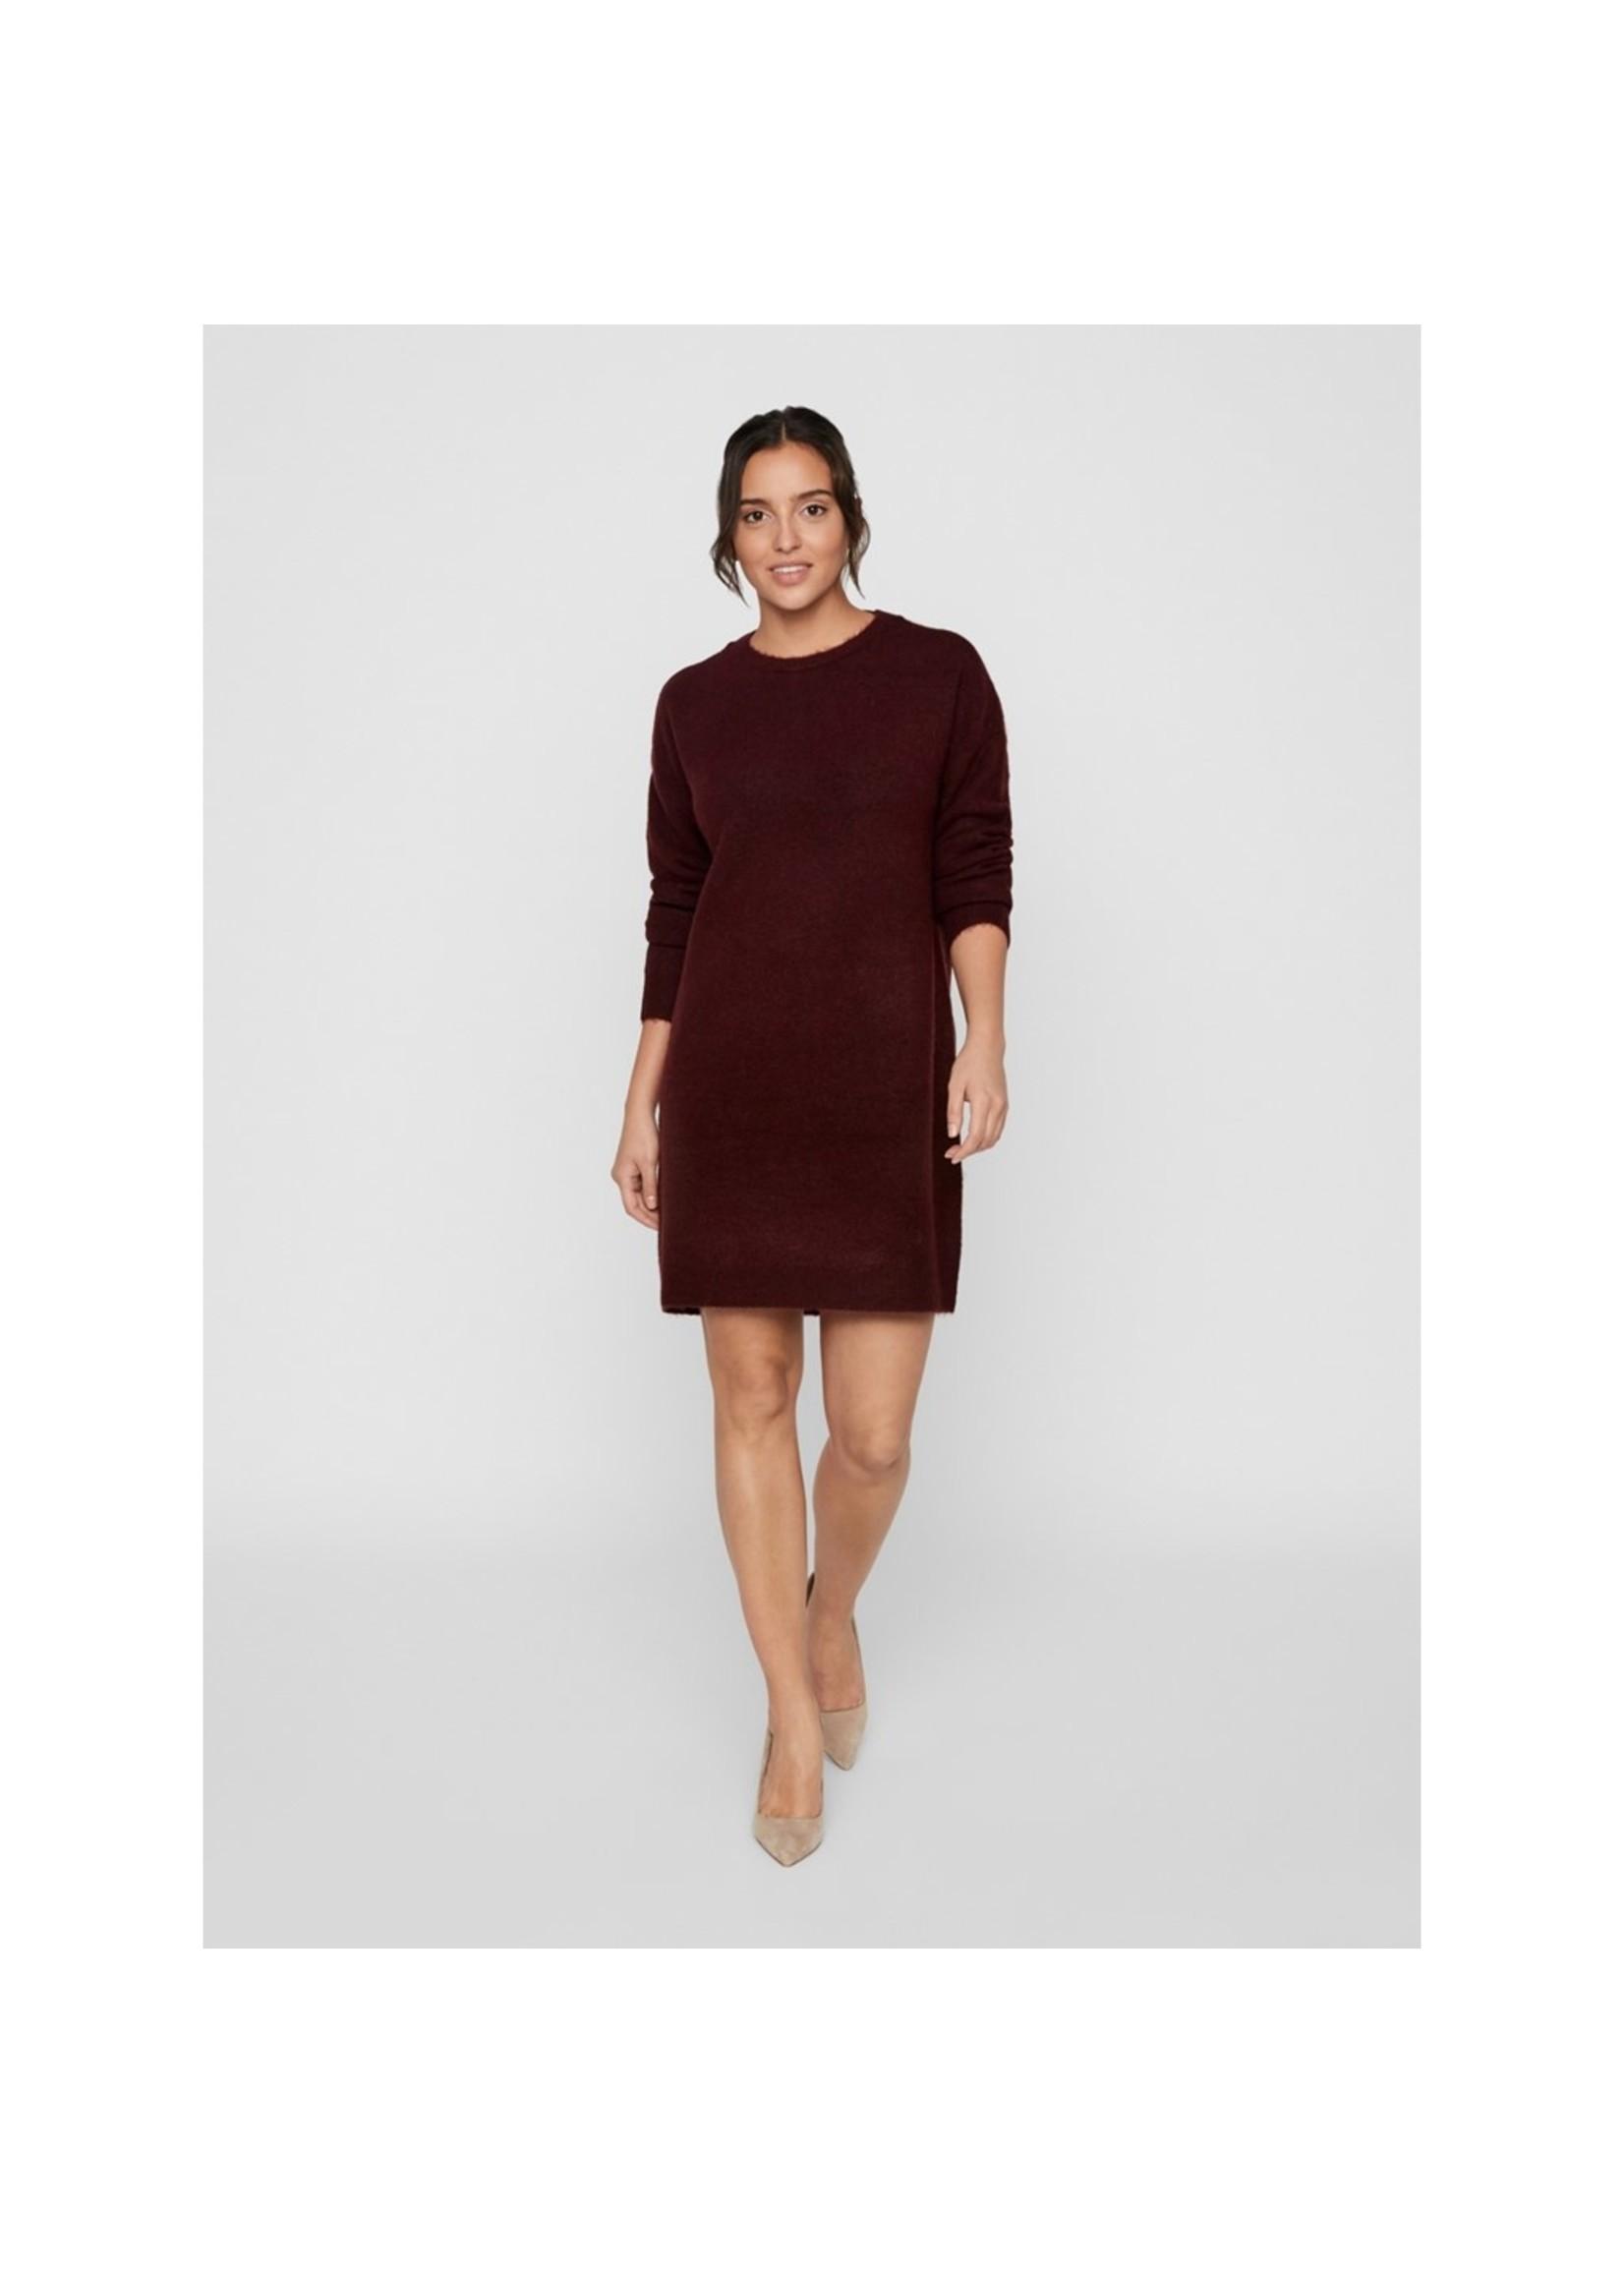 Vero Moda Blakely Iva Zipper Dress